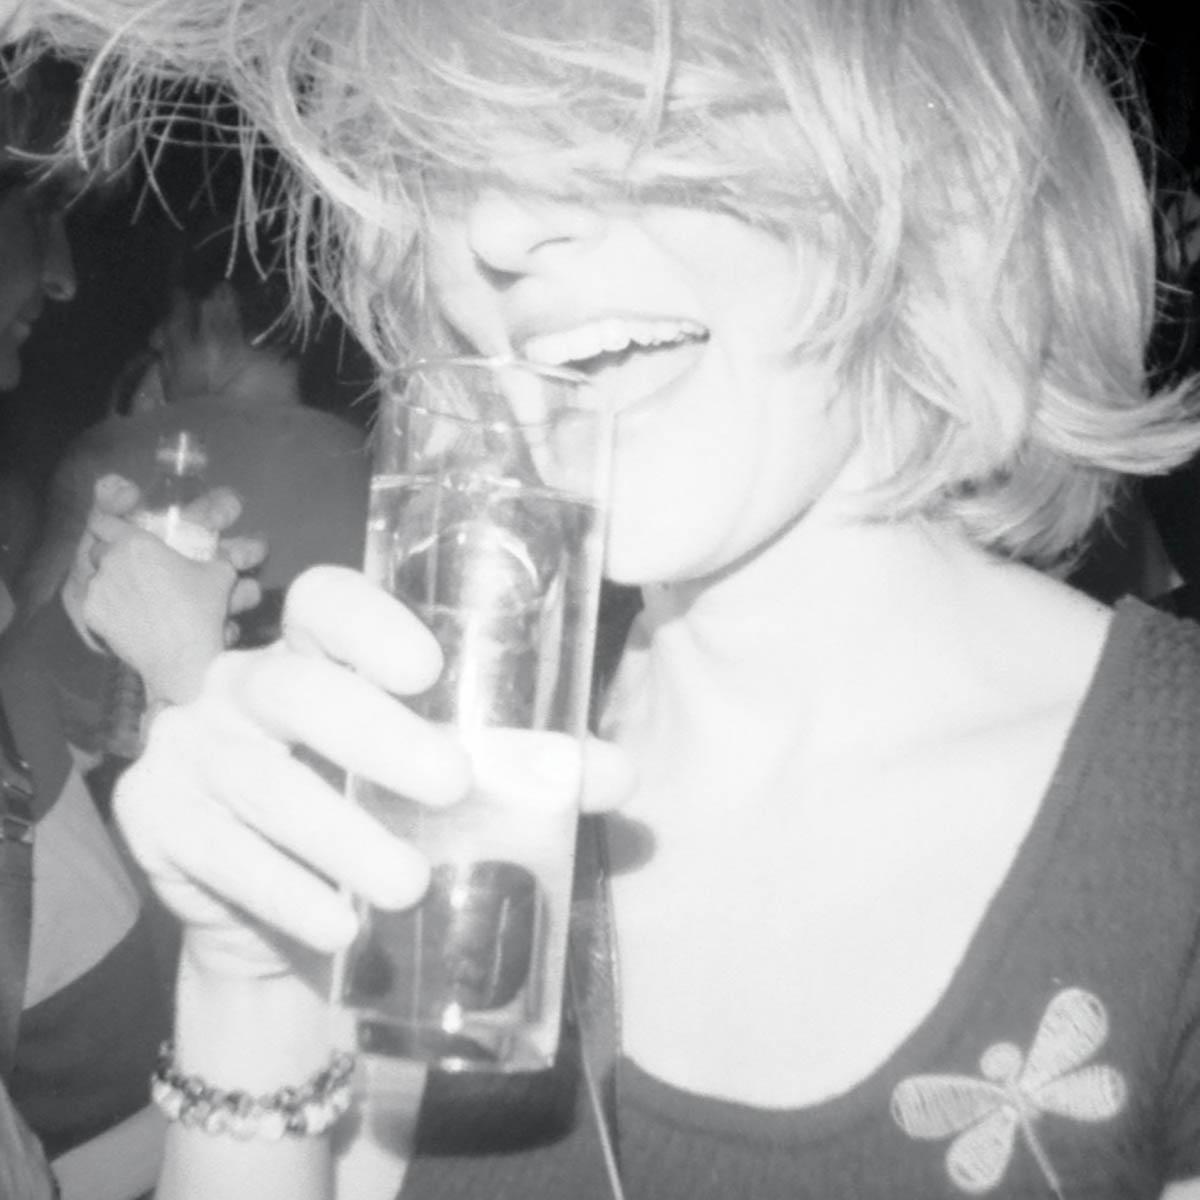 Ravishers, Ravishers